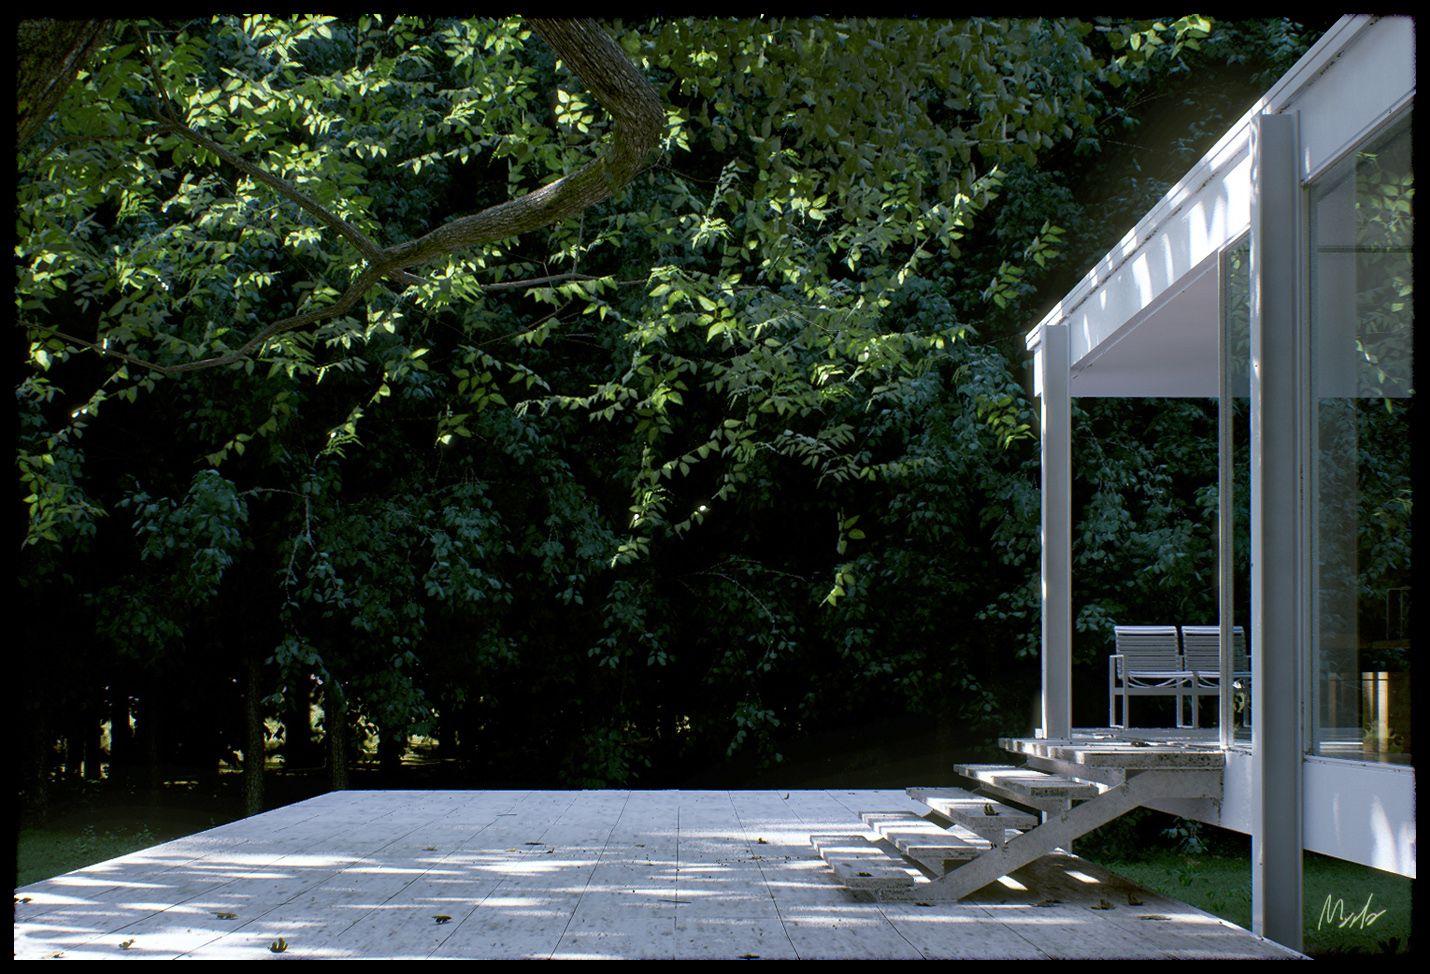 Farnsworth house by mies van der rohe exterior 8 jpg - Mies Van Der Rohe Farnsworth House By Alessandro Prodan